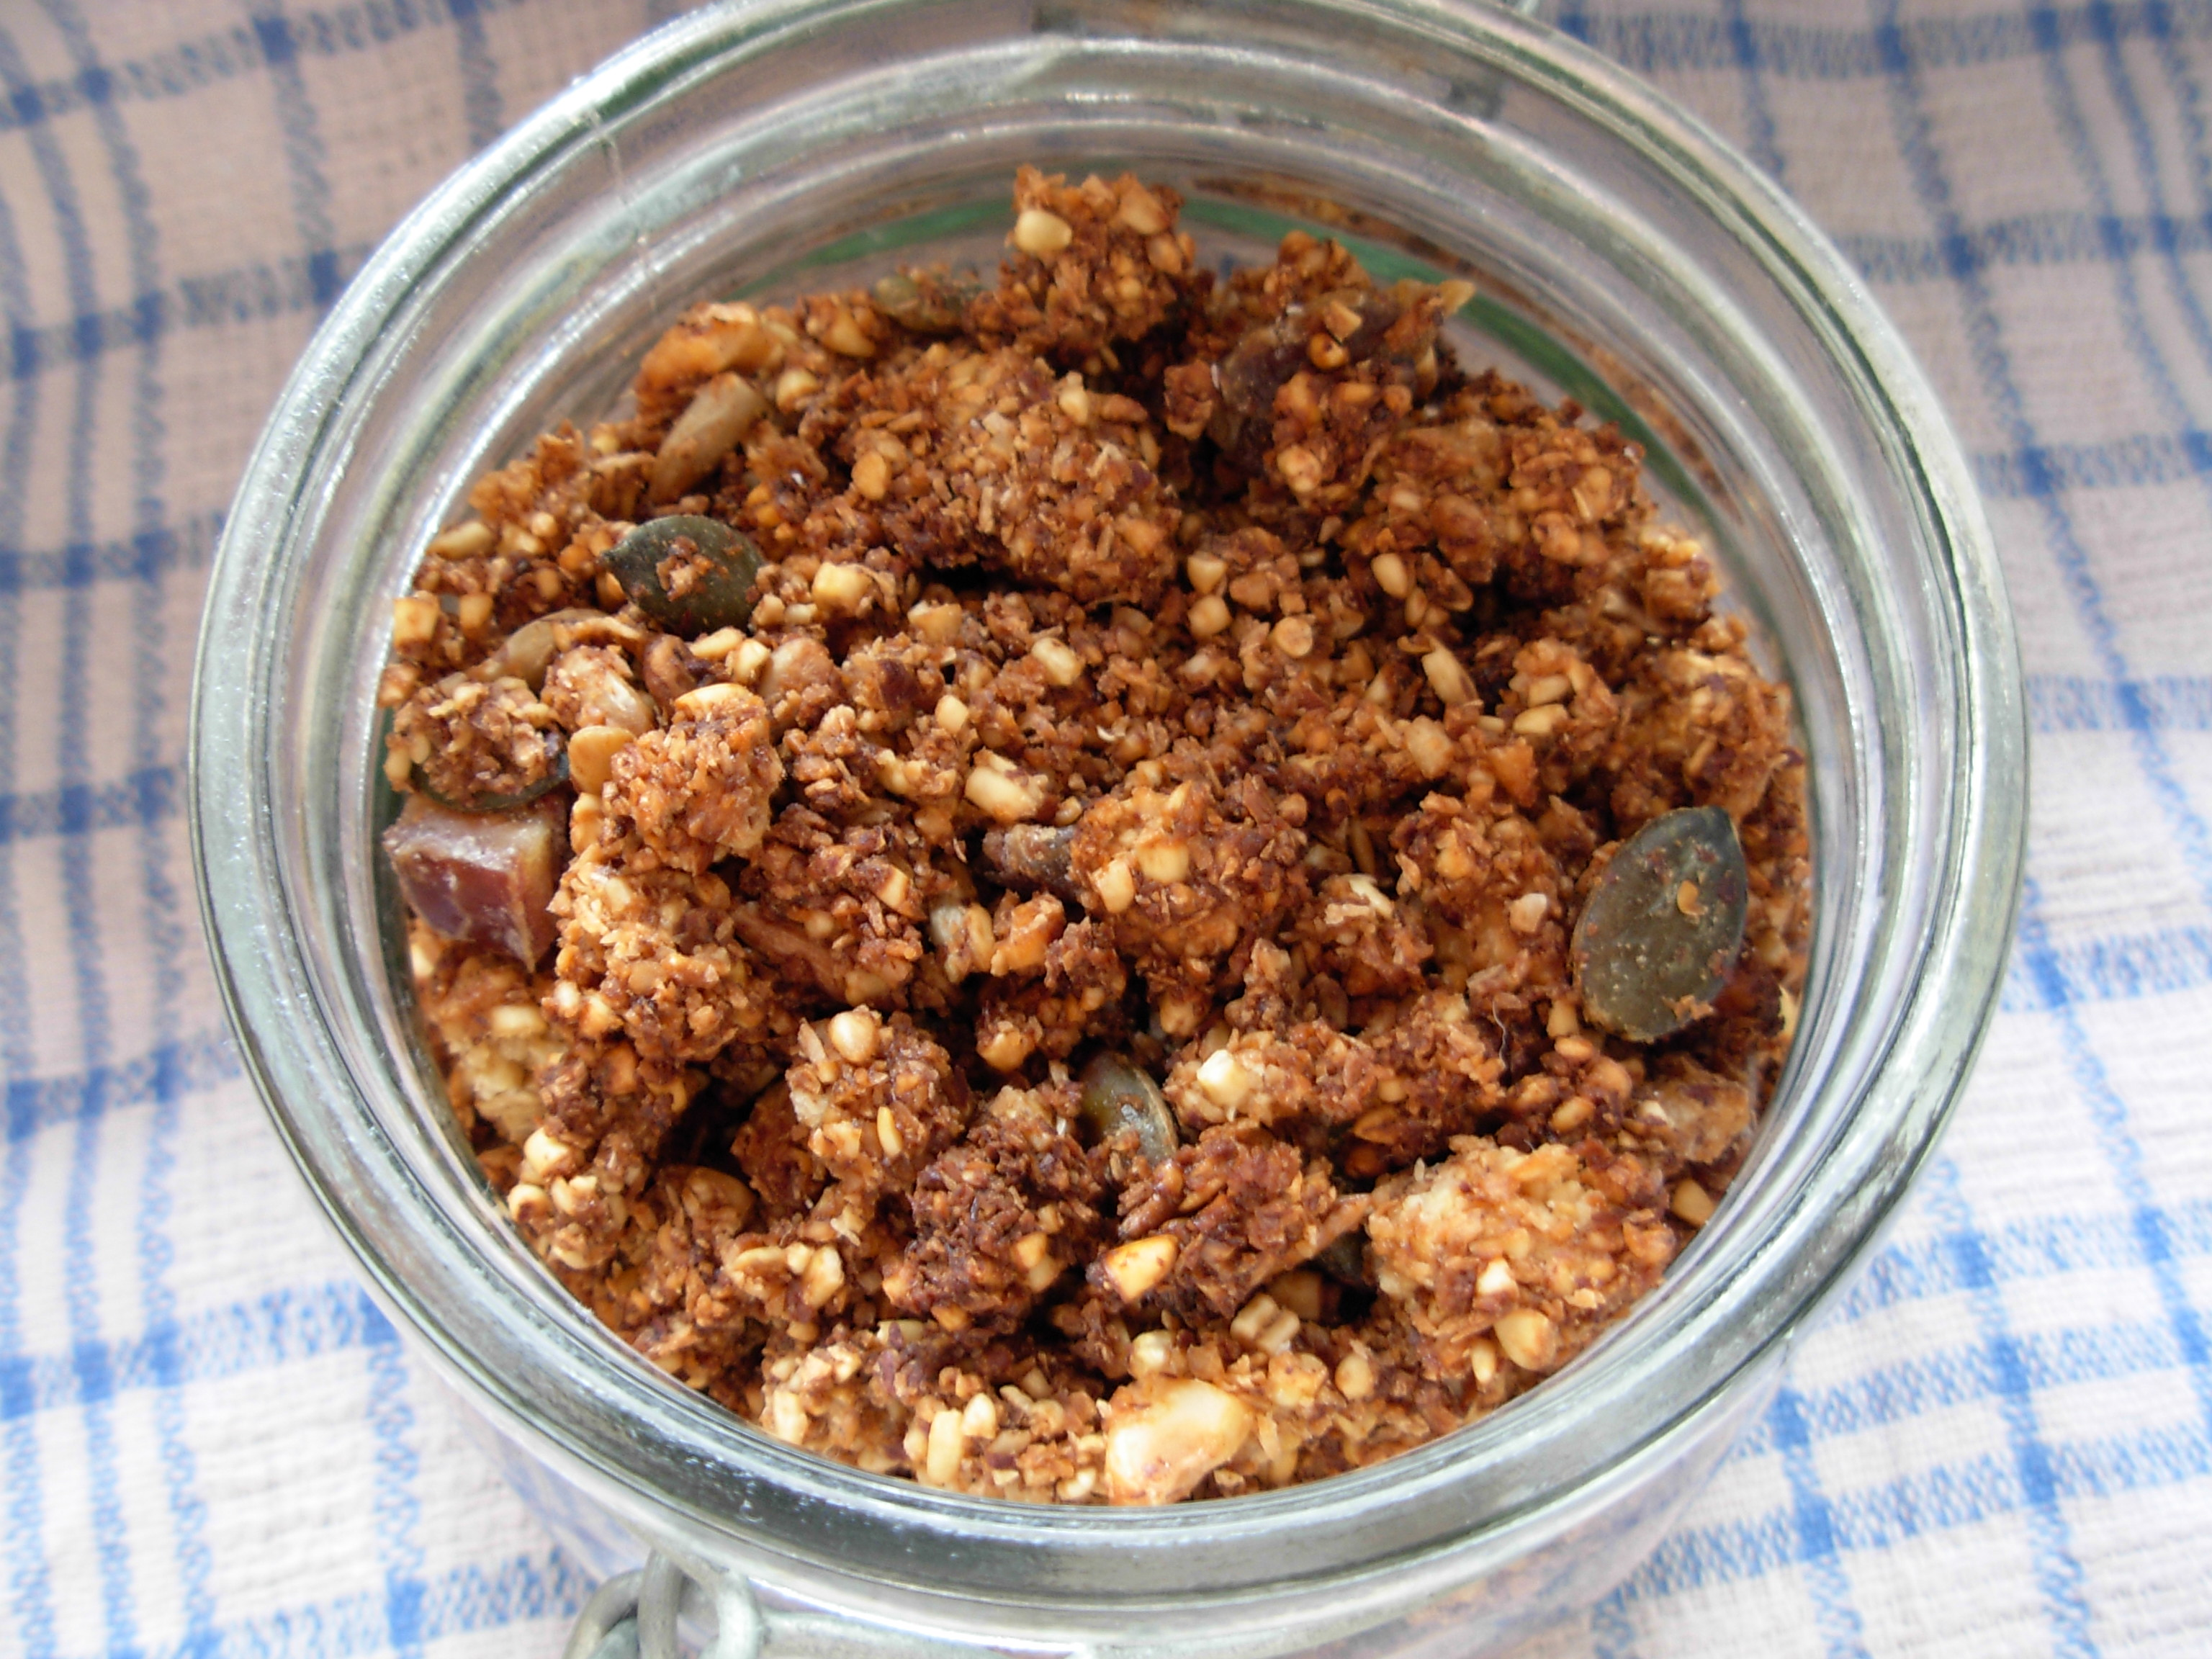 Sugar-free Granola